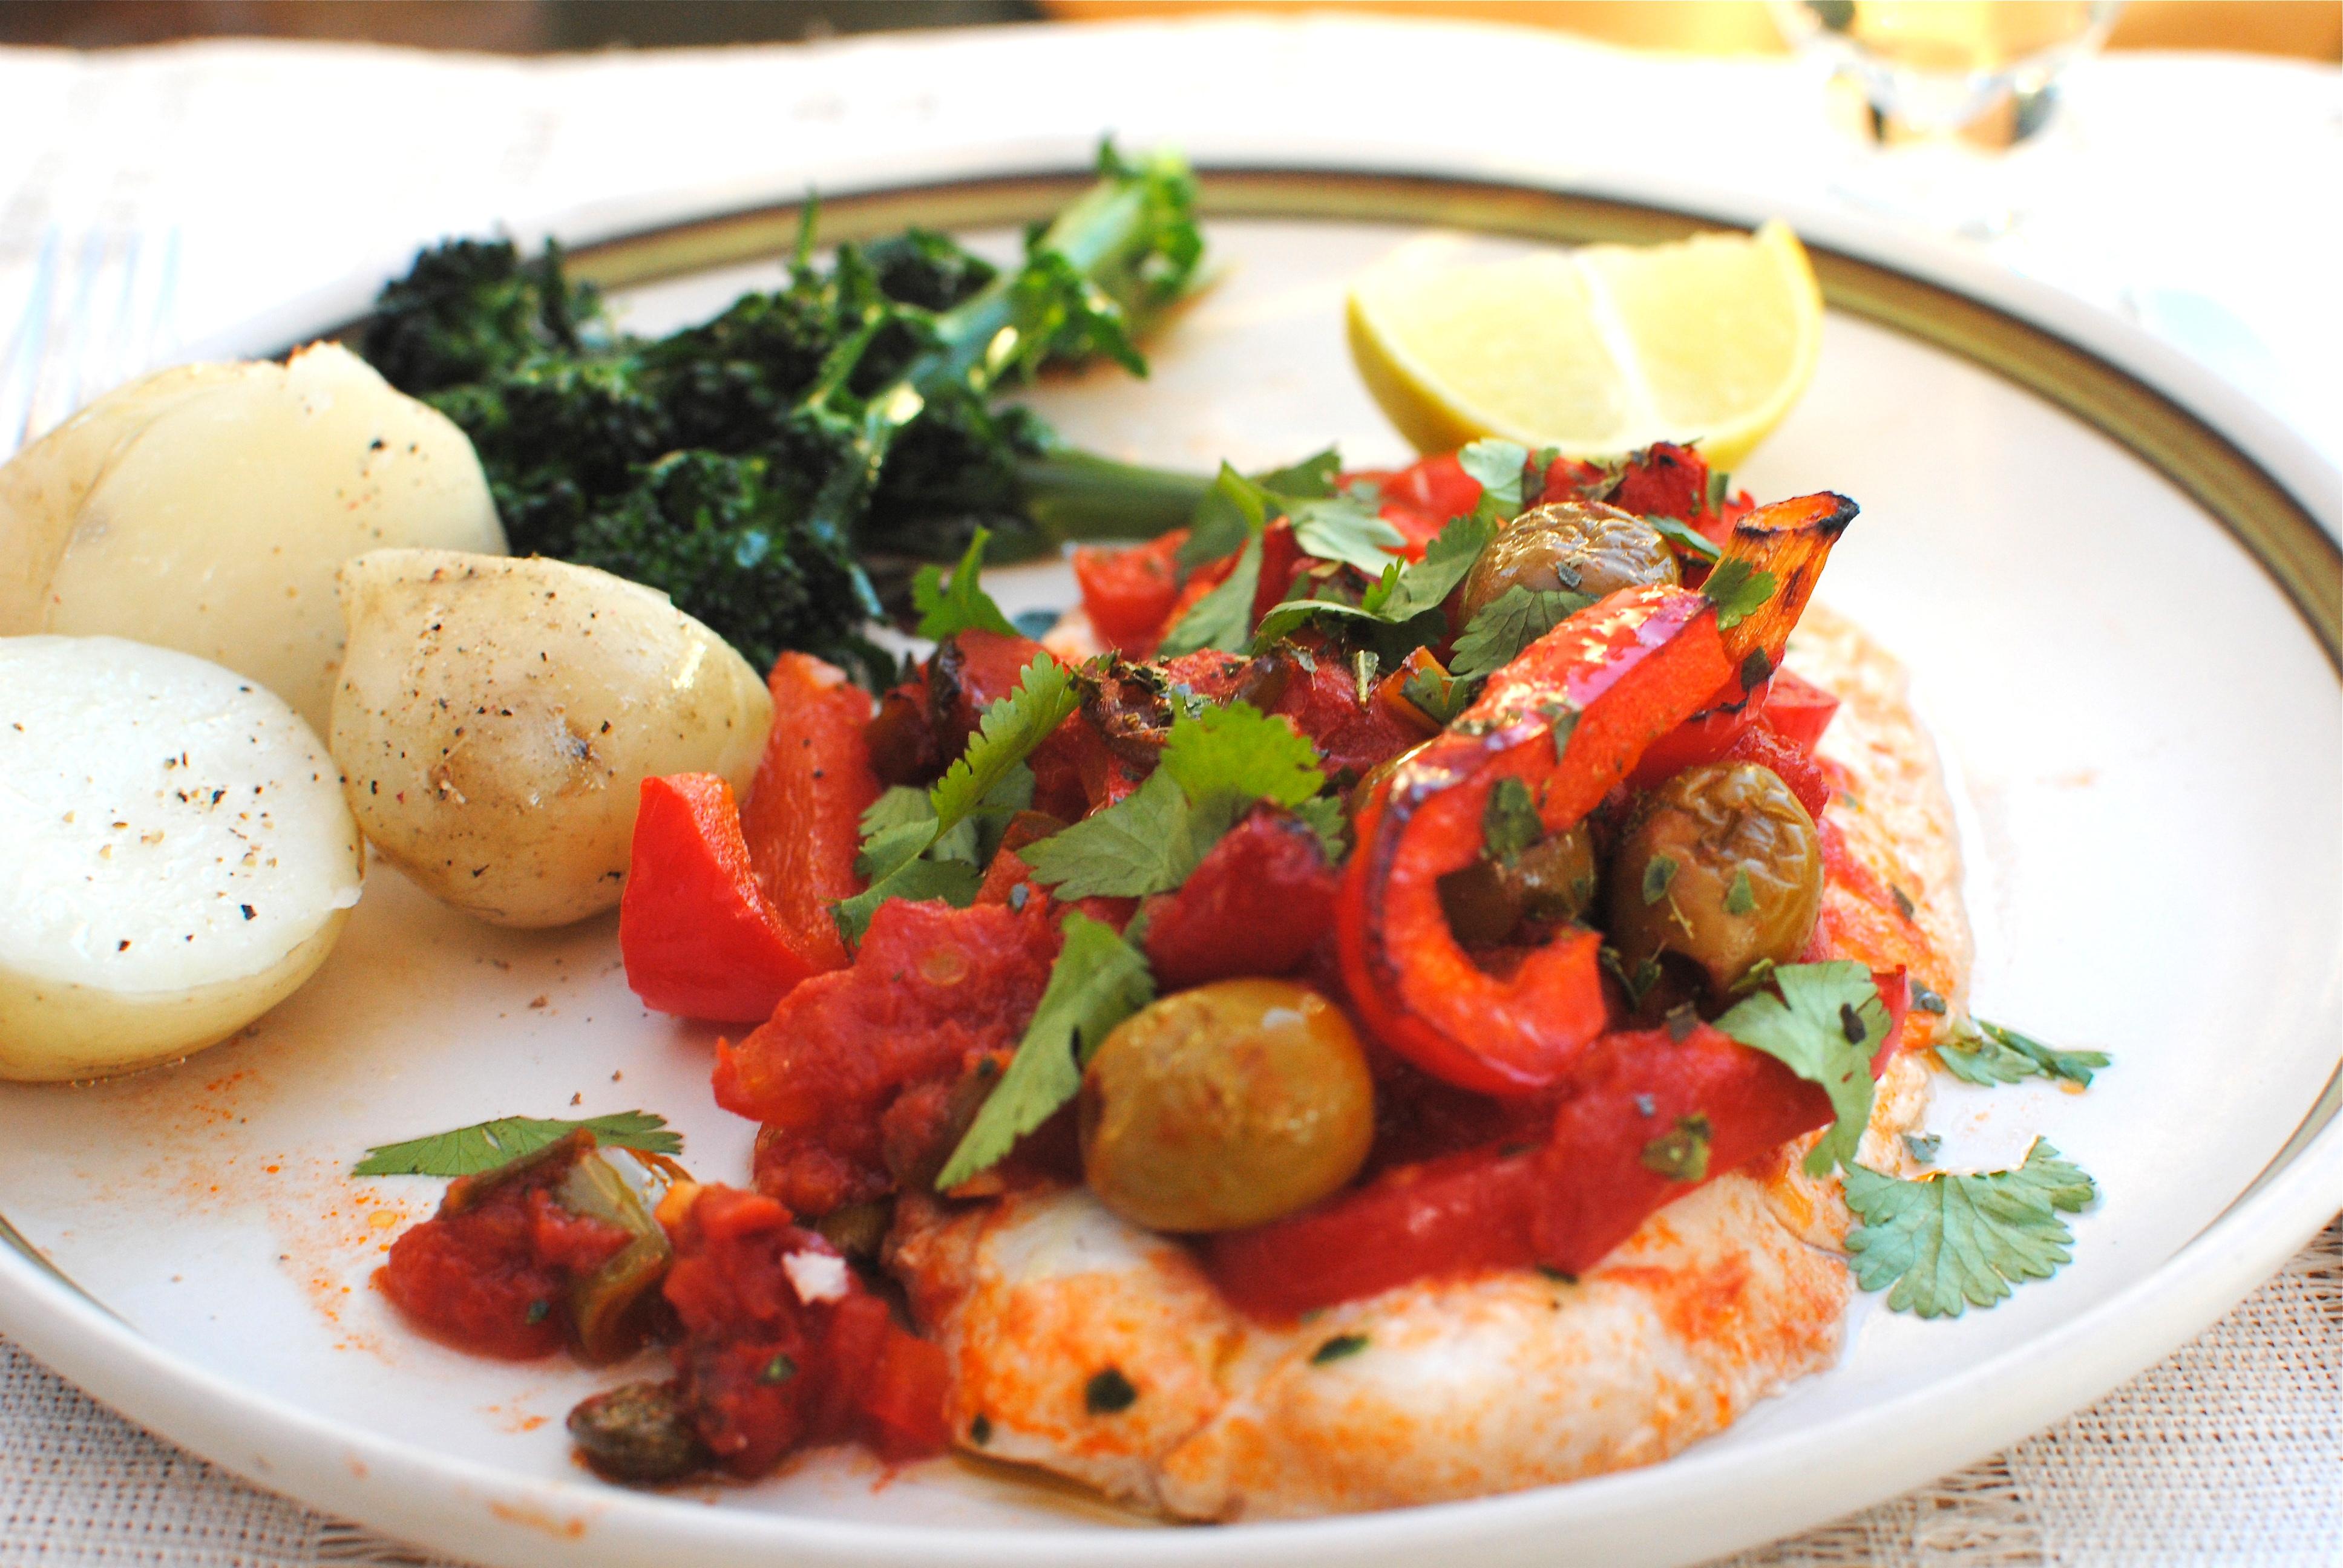 Salmon veracruz recipes food fish recipes for Fish veracruz recipe